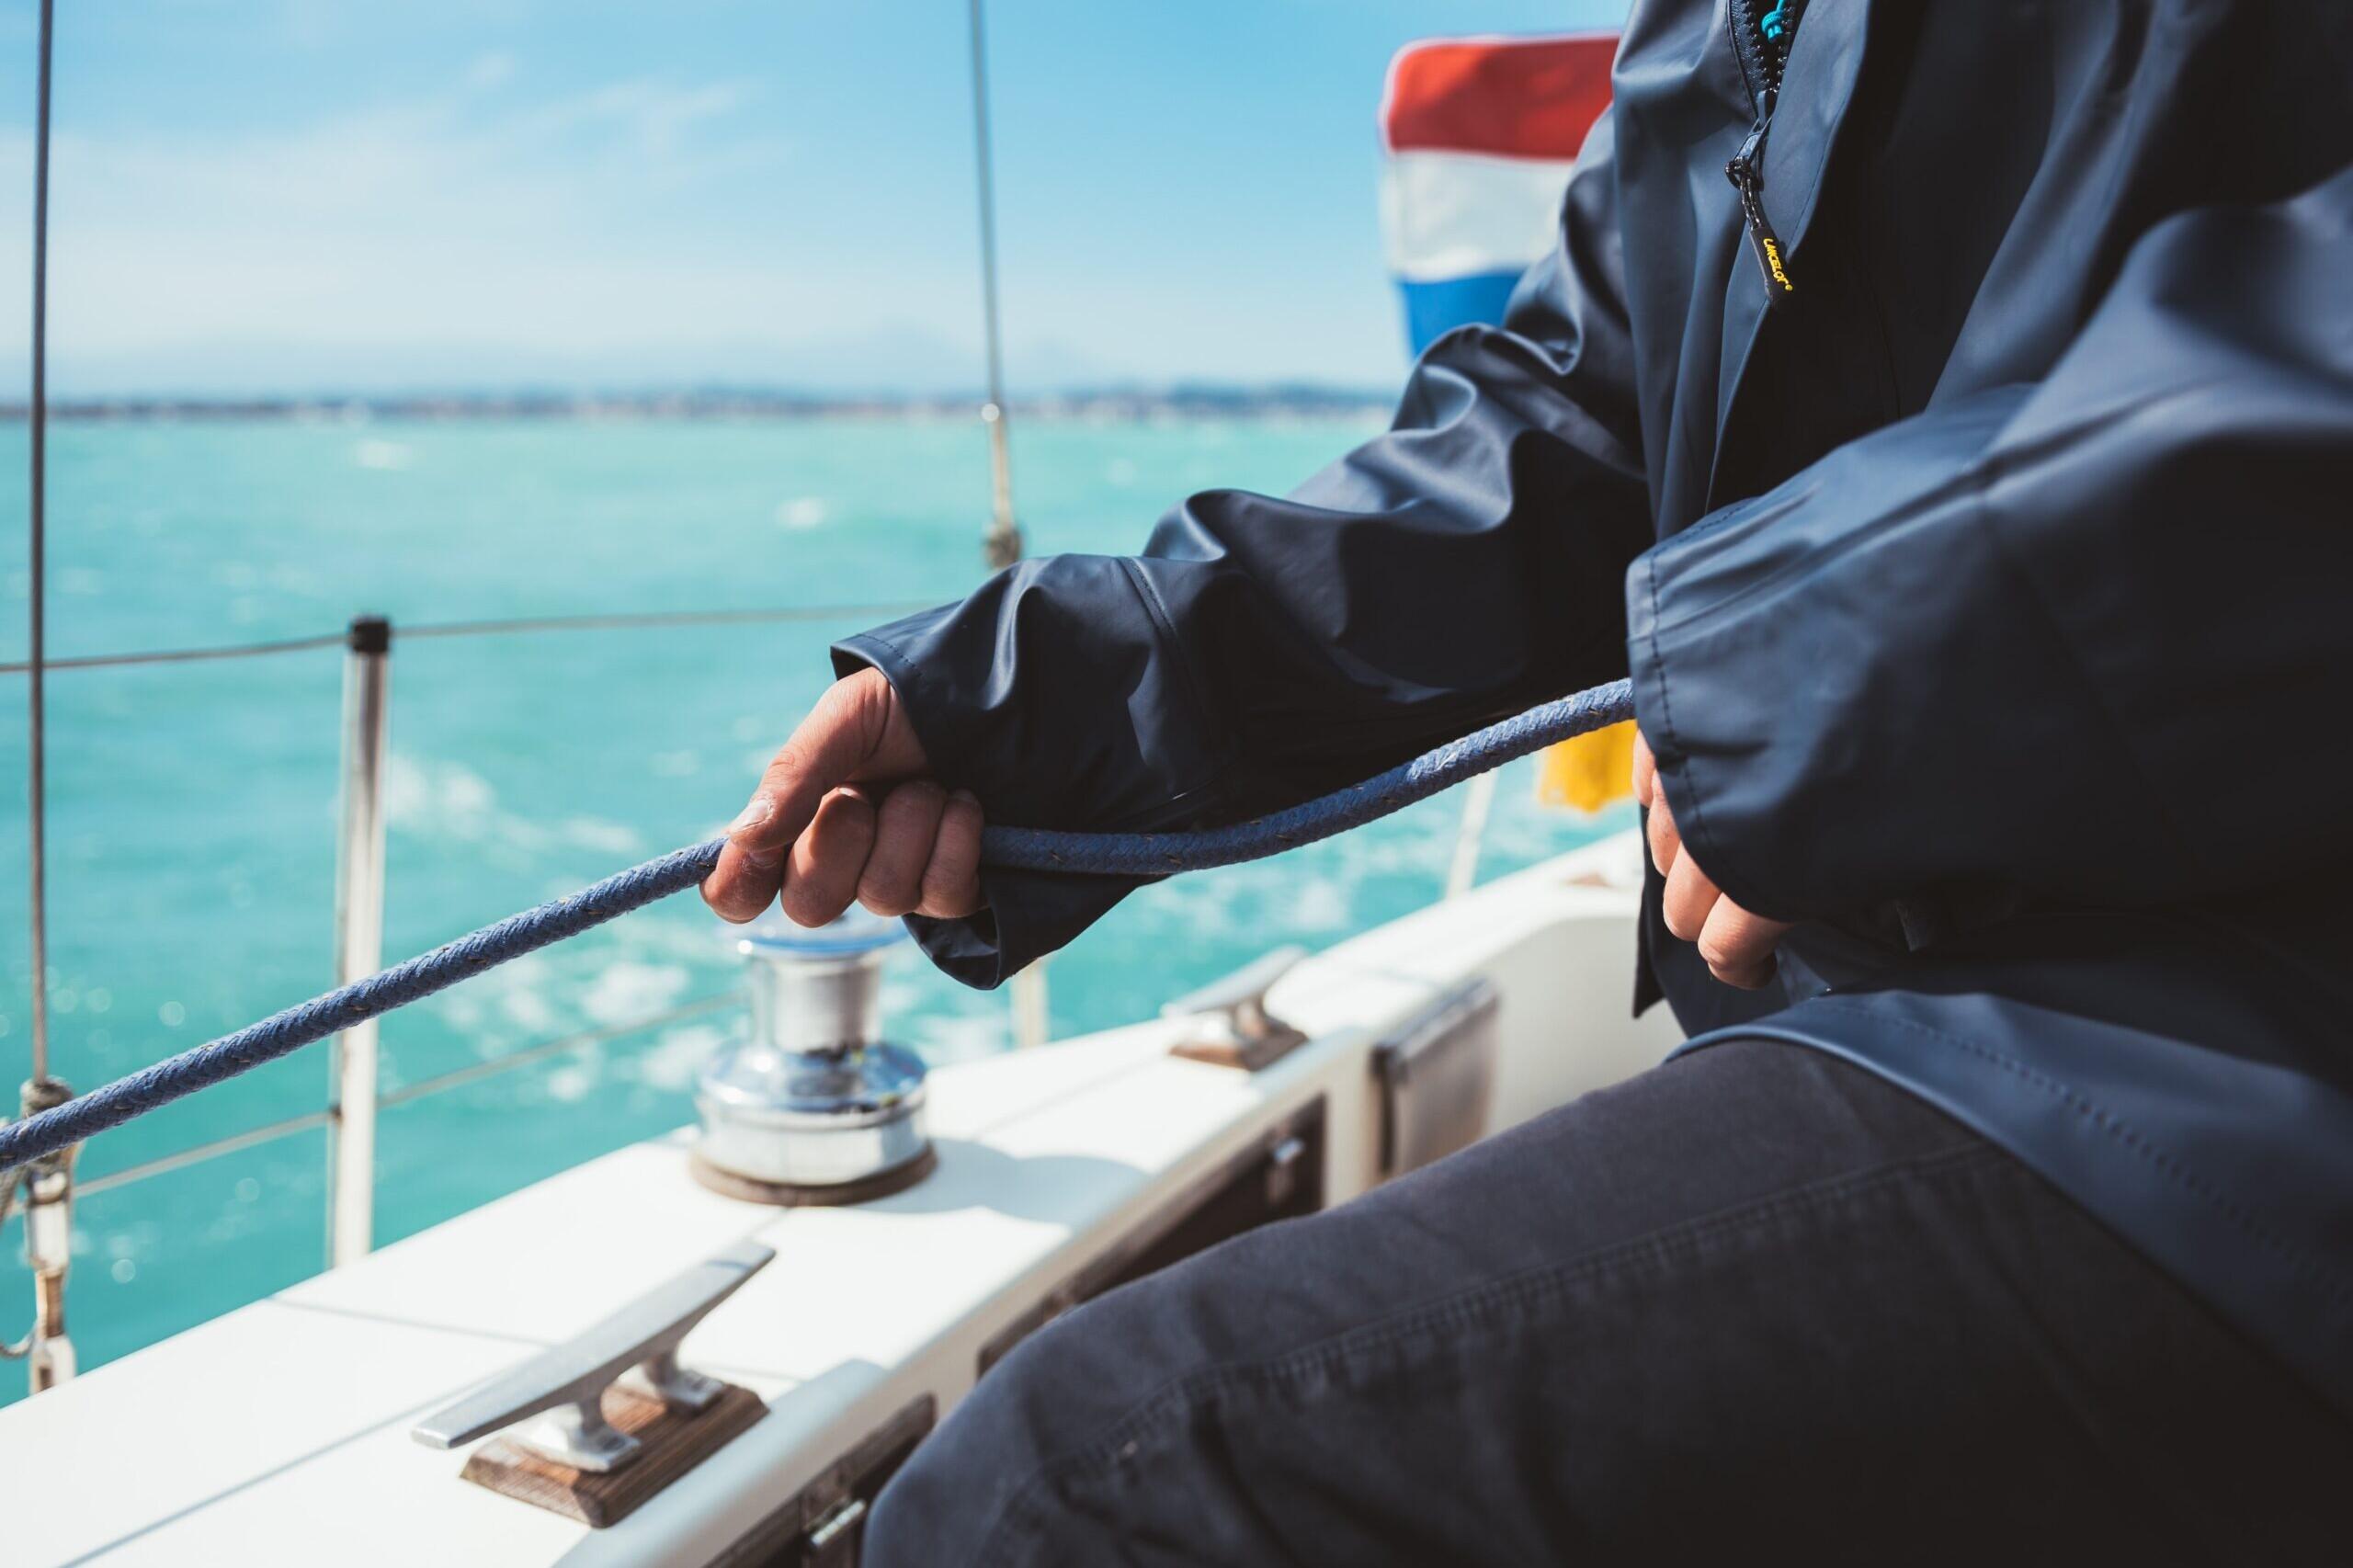 Man Fishing on a Sunny Summer Morning